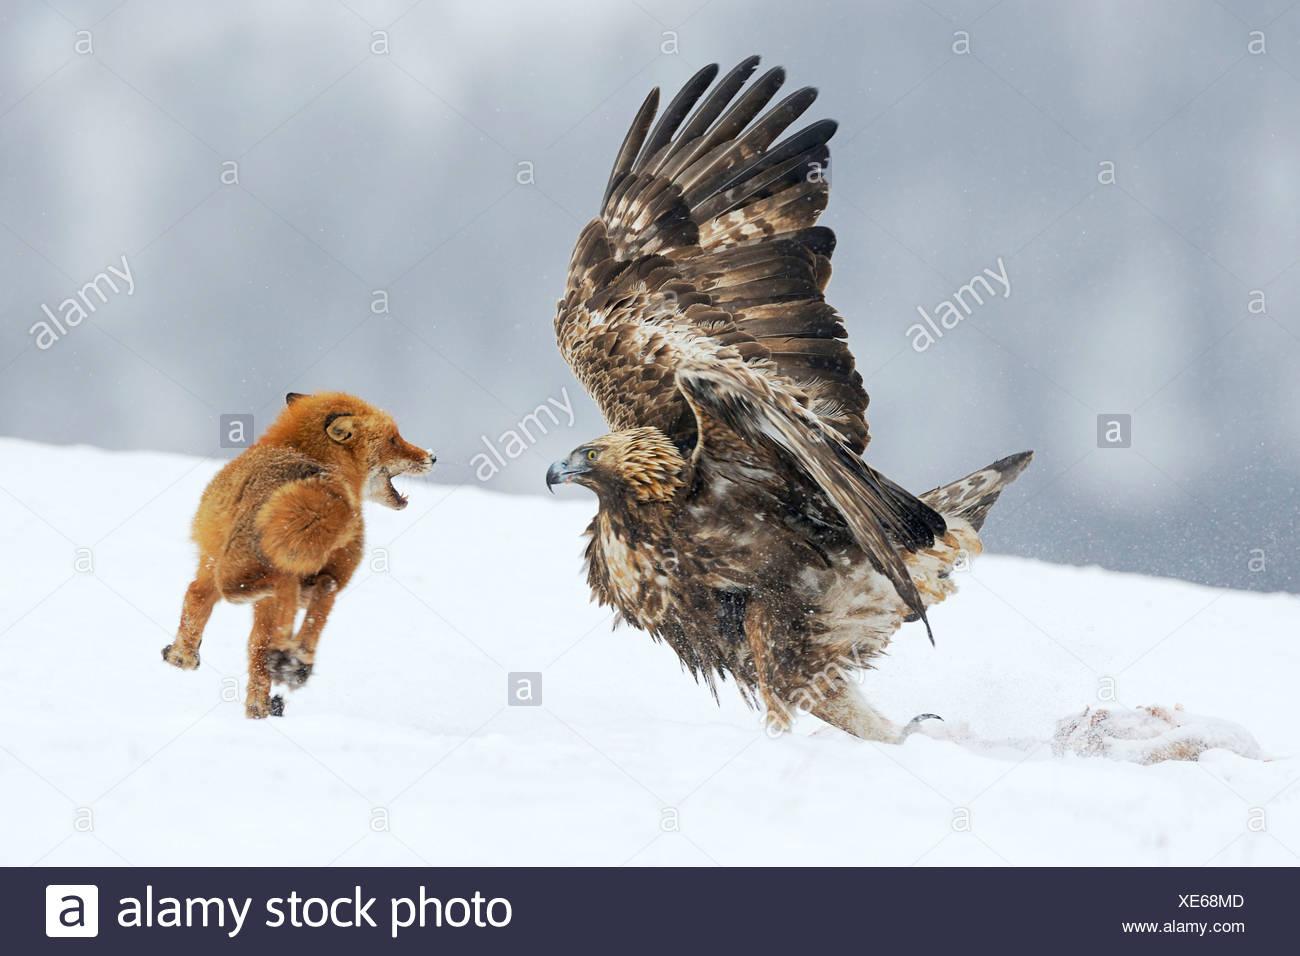 Steinadler (Aquila Chrysaetos) kämpfen mit einem Rotfuchs (Vulpes Vulpes) über einen Kadaver, Naturpark Sinite Kamani, Bulgarien Stockbild